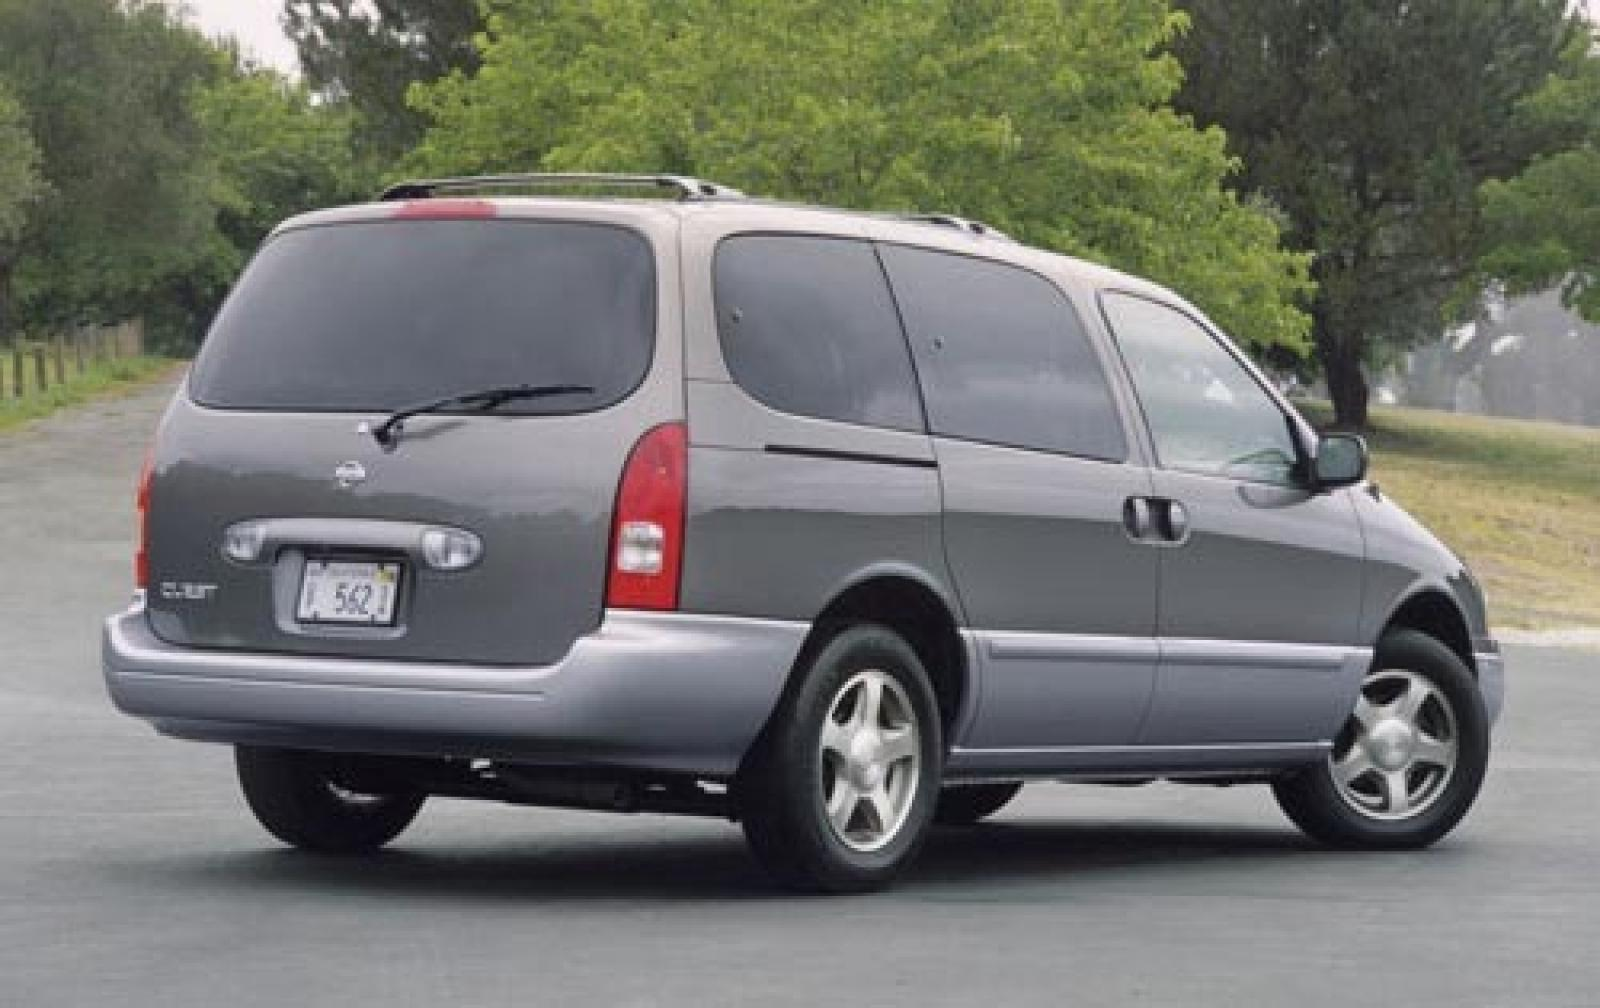 Nissan Quest Ii Minivan Exterior